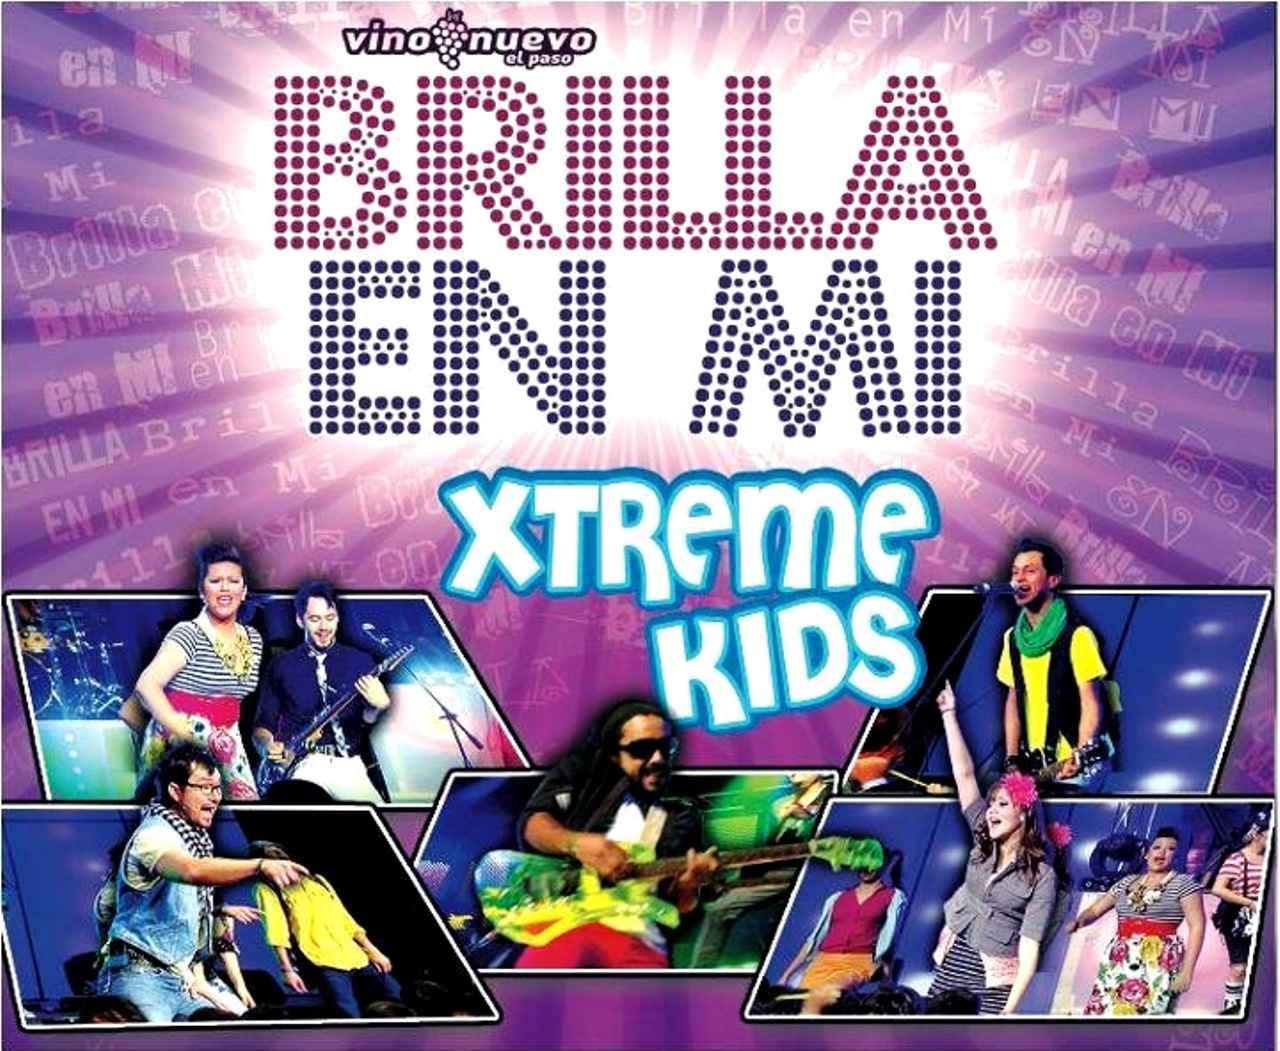 Xtreme Kids, Brilla en mí